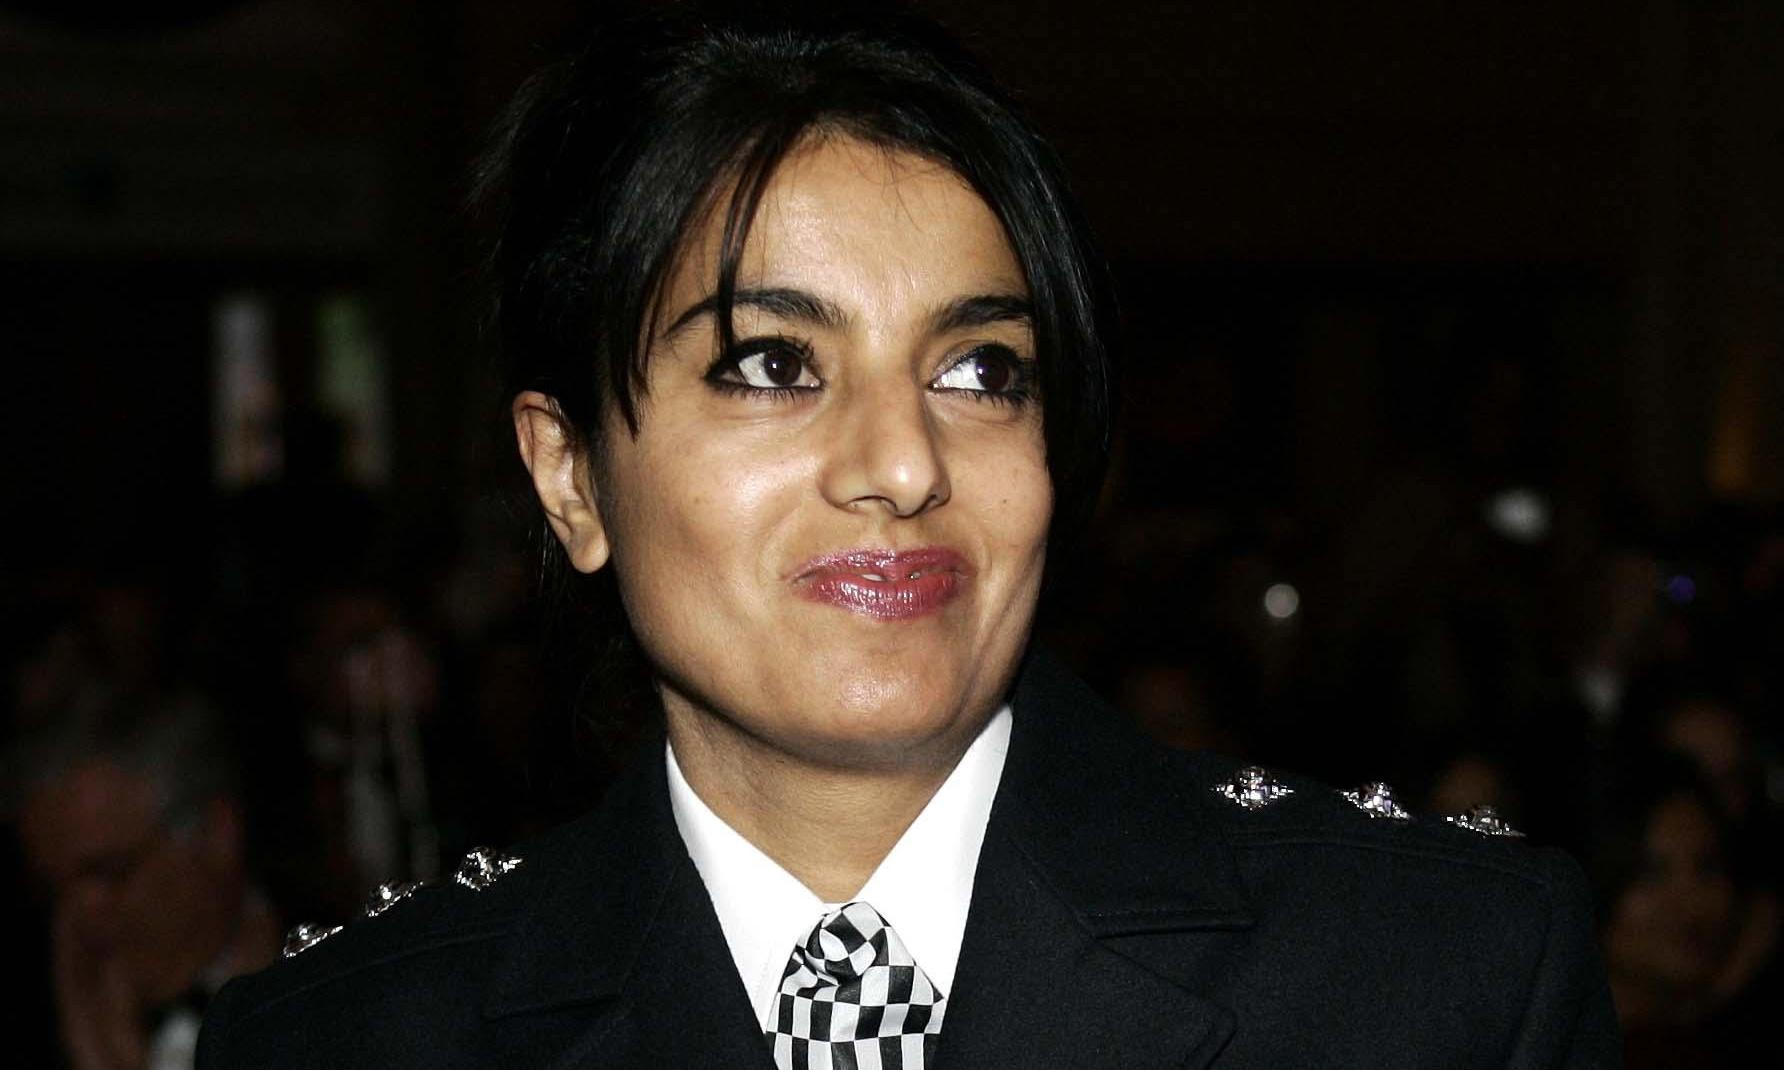 Senior female Asian police officer accuses Met of discrimination